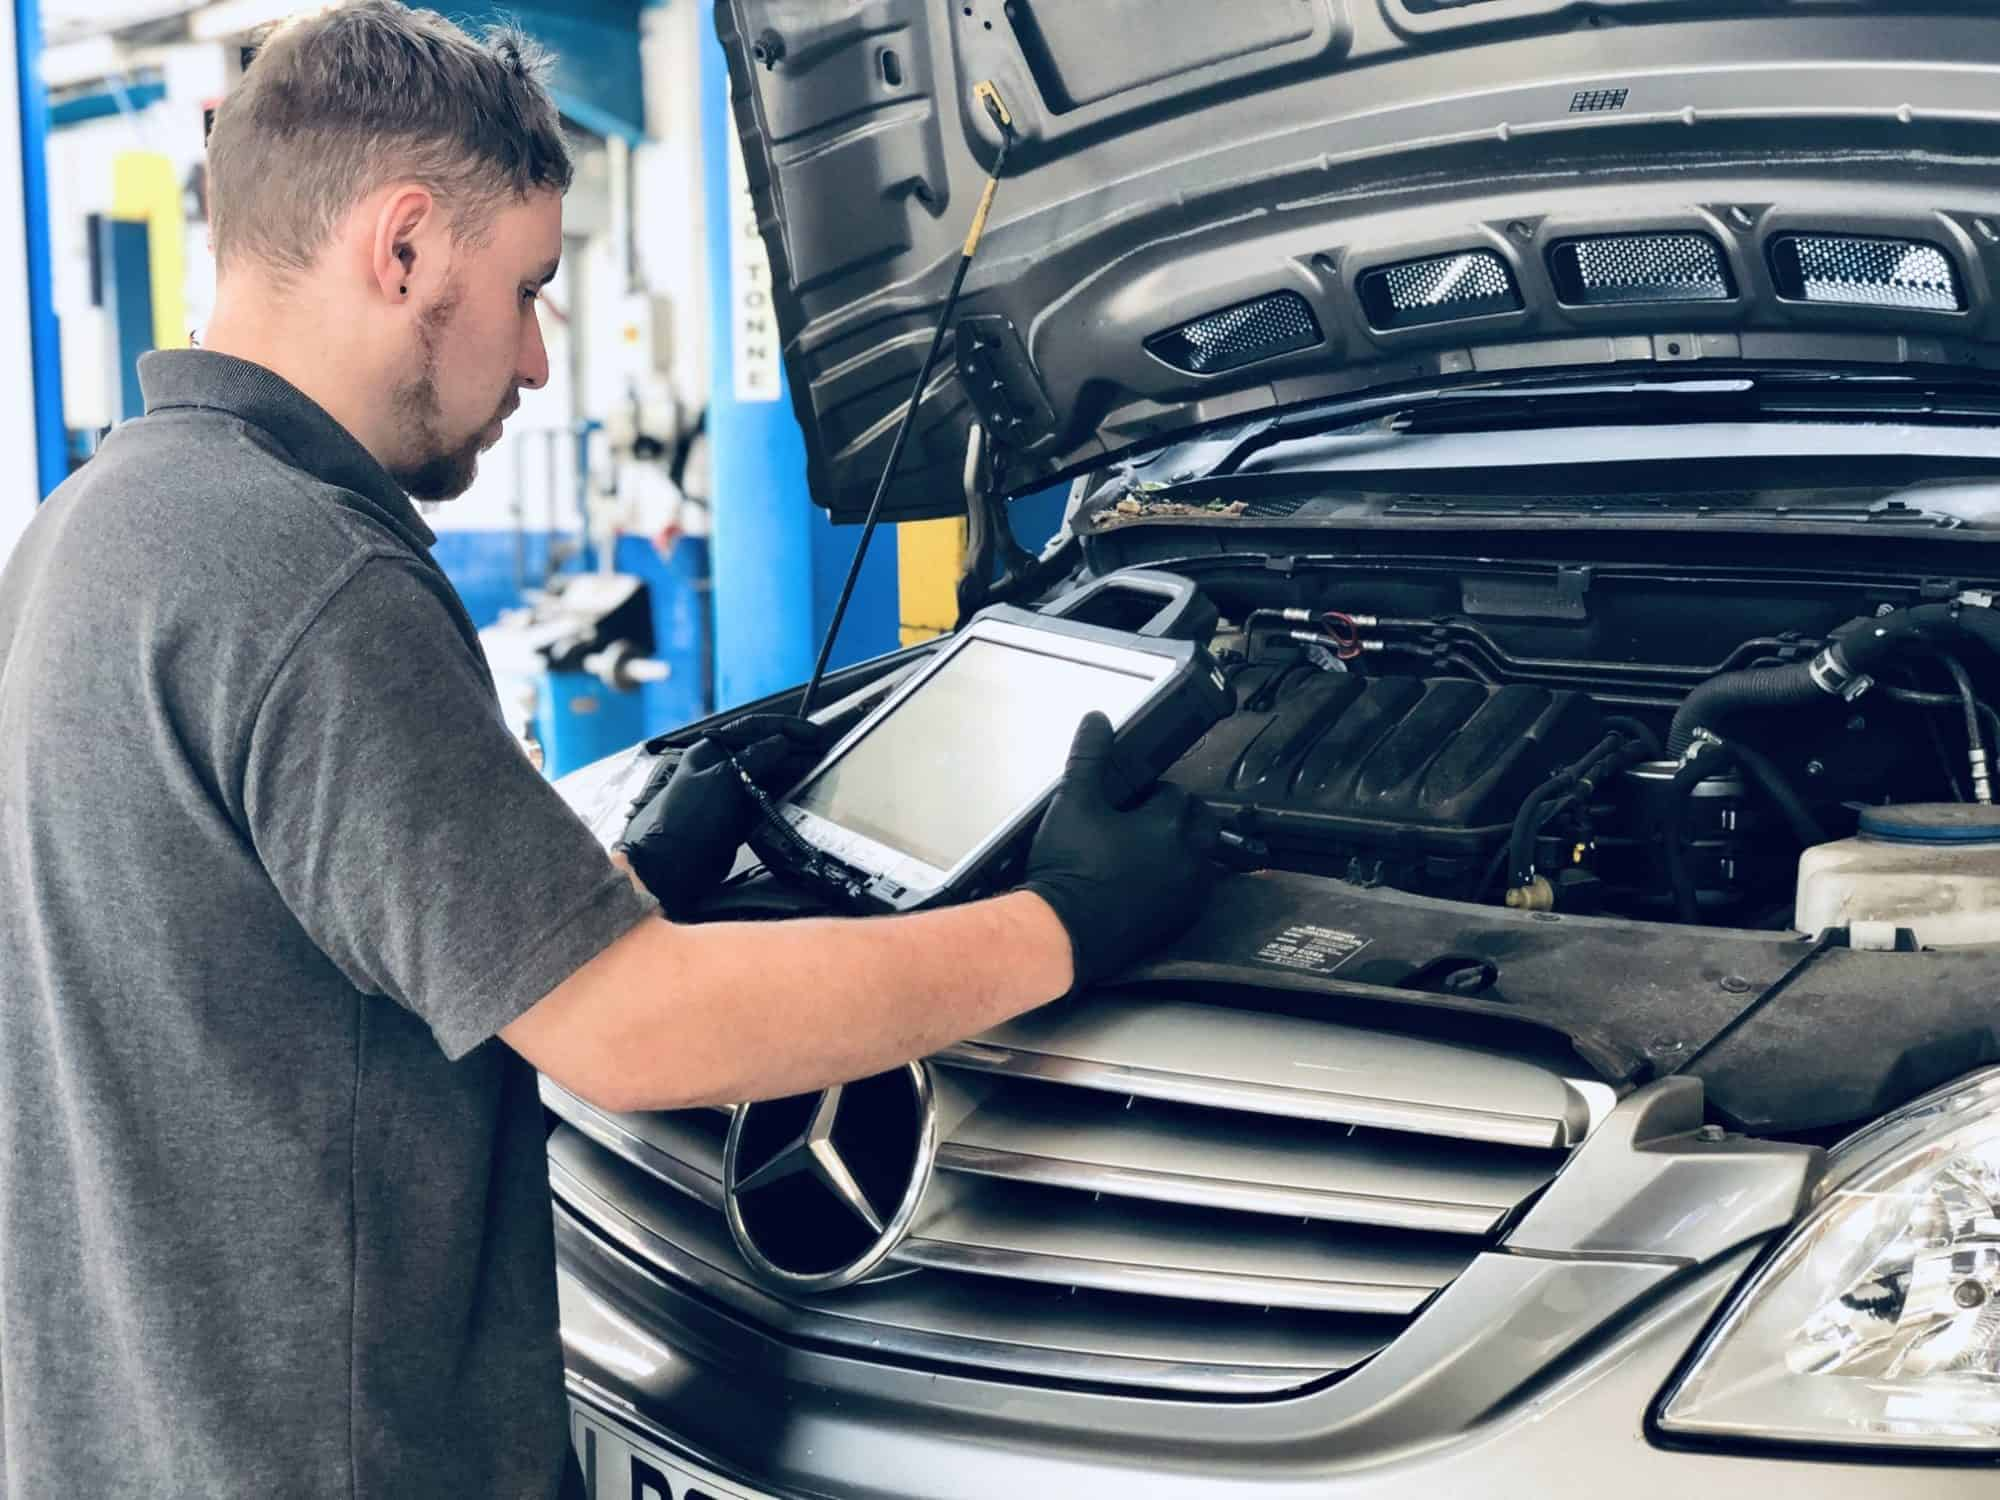 Our expert technician working on a Mercedes-Benz